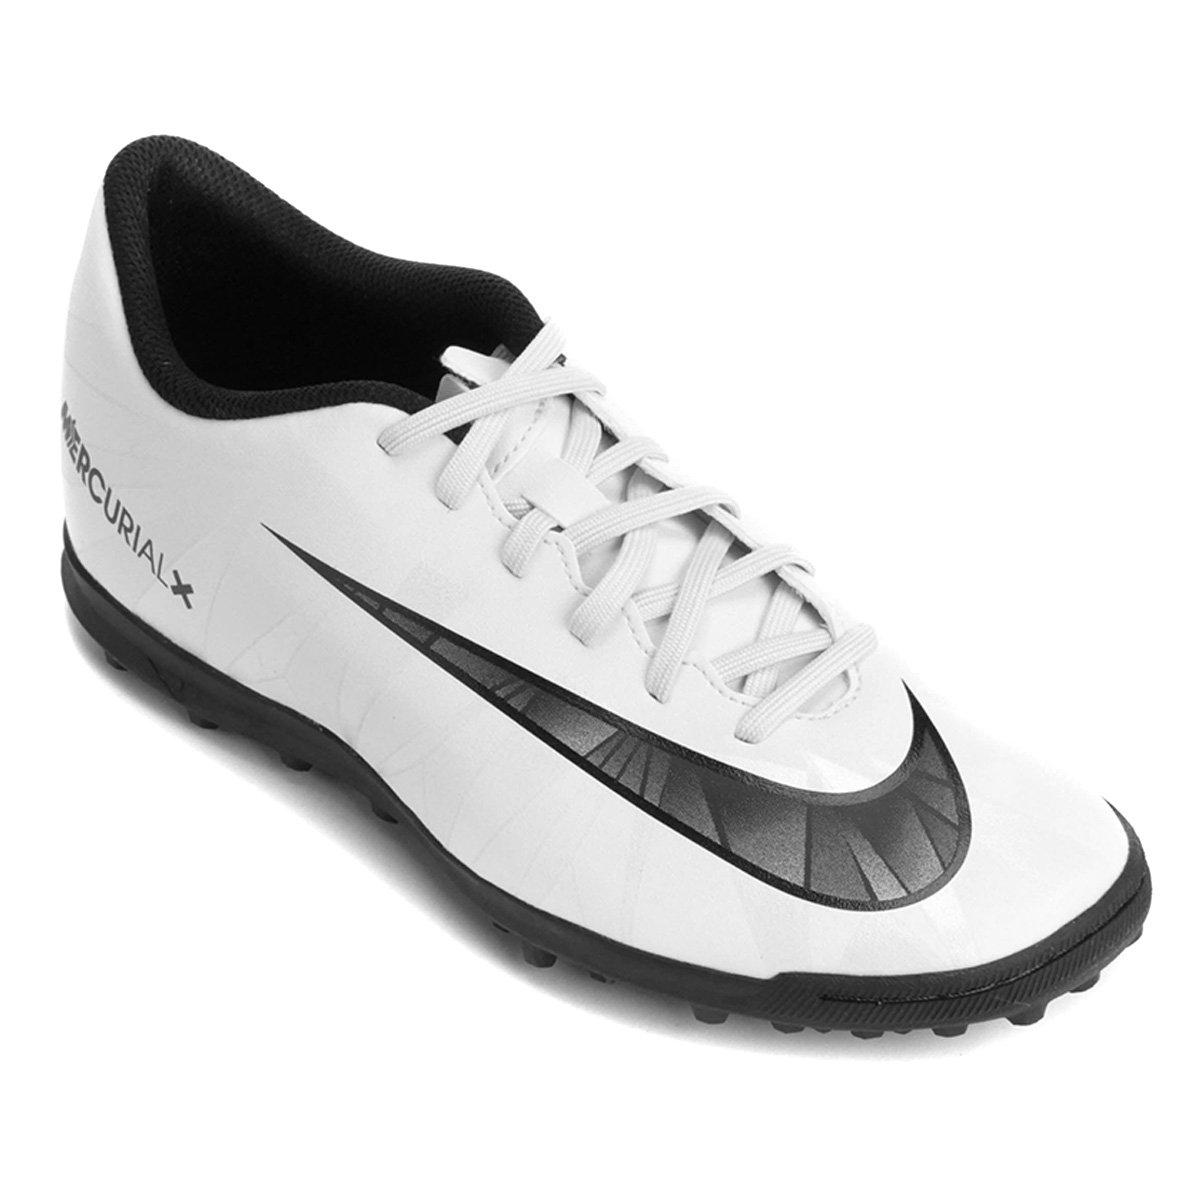 ... Chuteira Society nike Mercurial X ortex 3 CR7 TF Masculina Masculina TF  Compre ffe506 lower price  adidas ... 119f7eade7d30